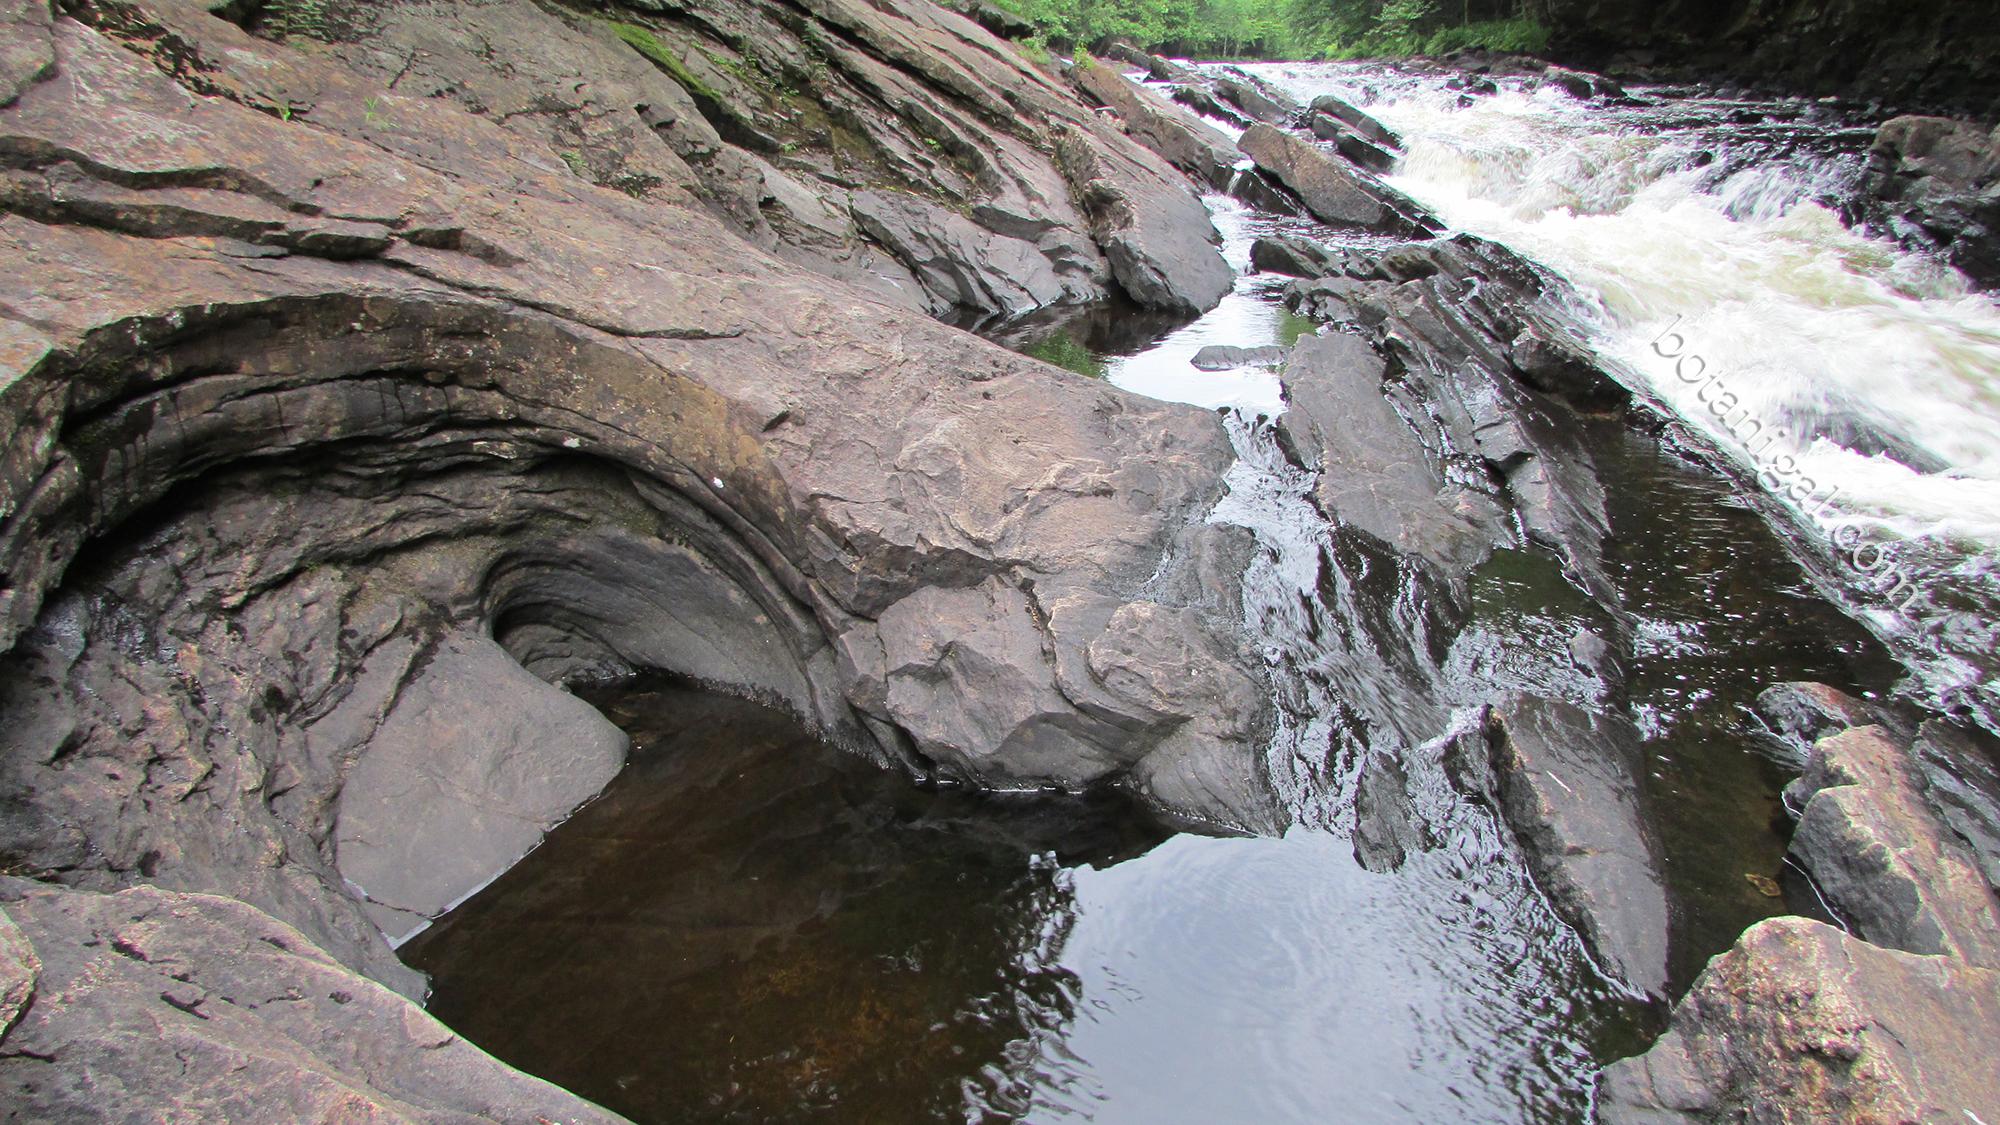 R.K. 3 Oxtongue Rapids Geology July 24 2016 092 wtm.jpg